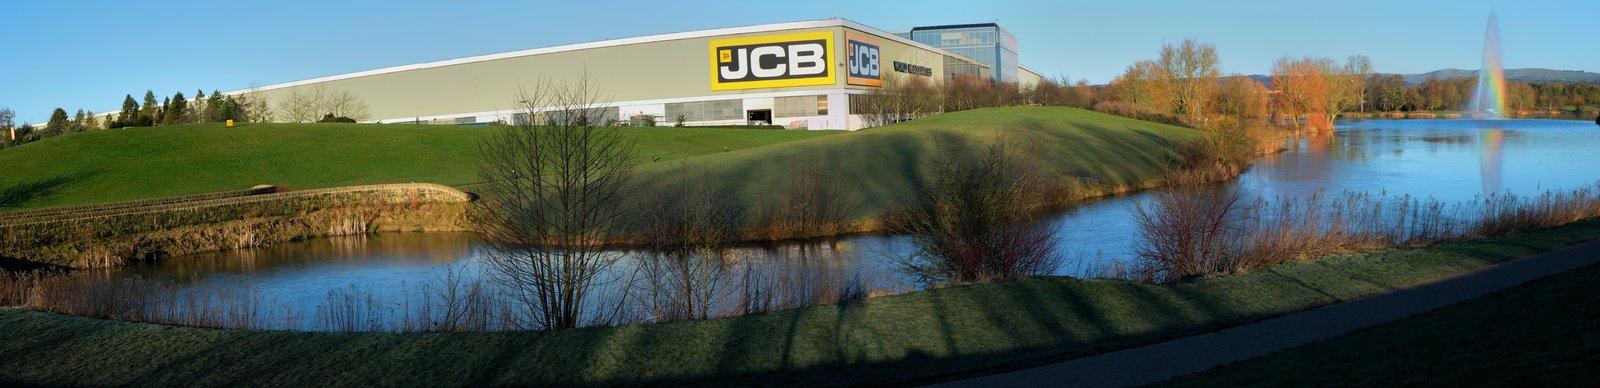 JCB.Panorama 1.web.jpg